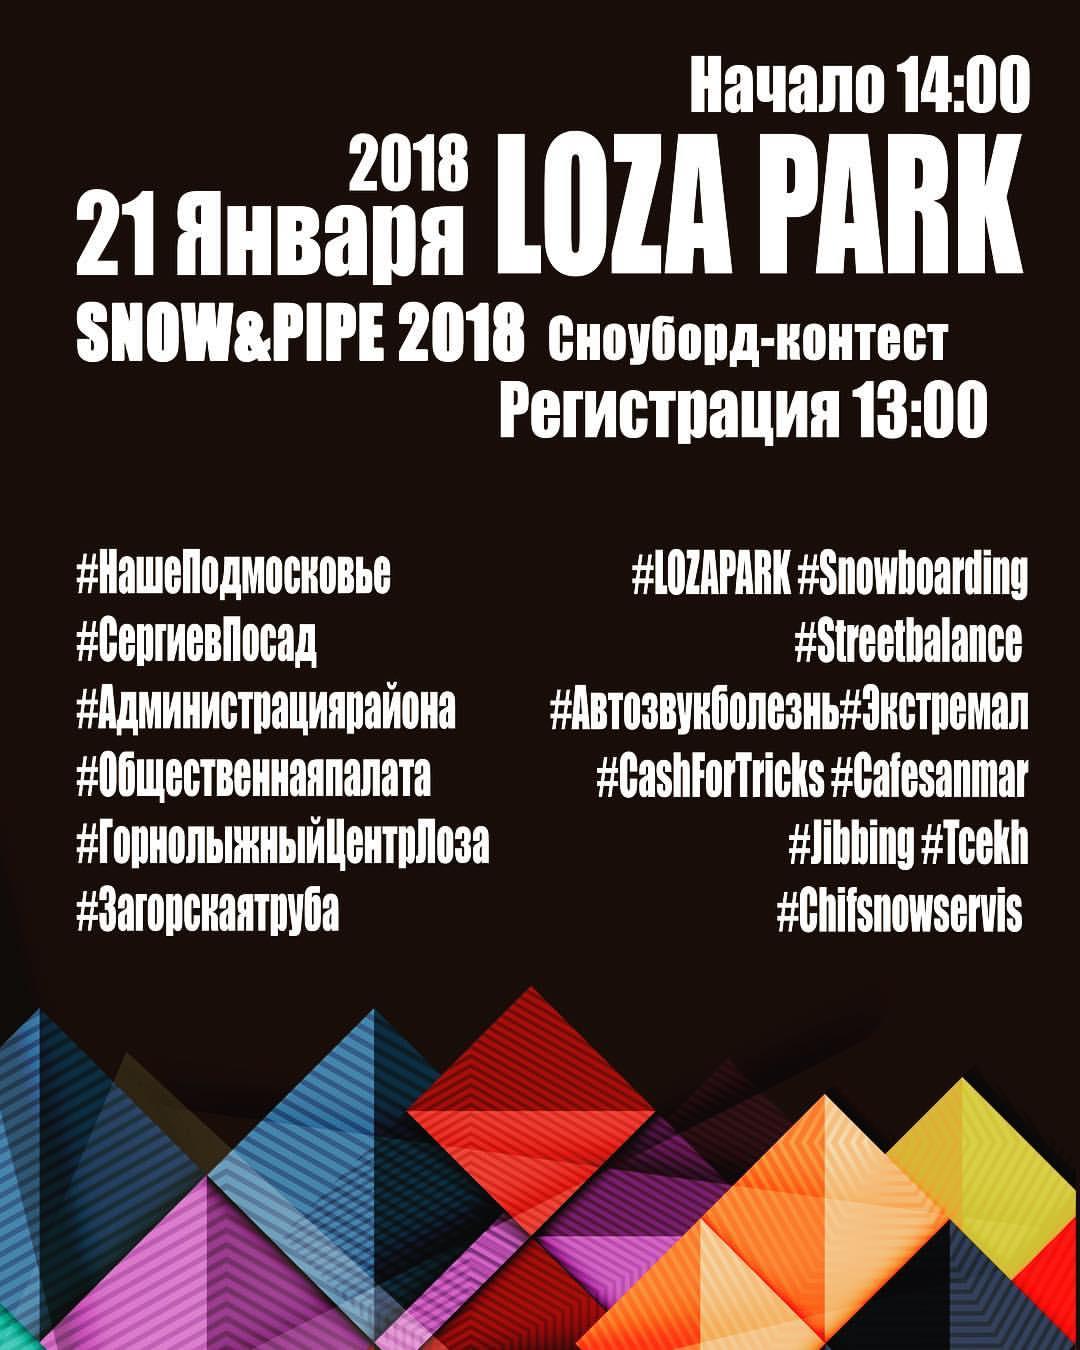 Спартакиада по сноубордингу в LOZA PARK | 21 января | Школа серфинга Surf-Burg